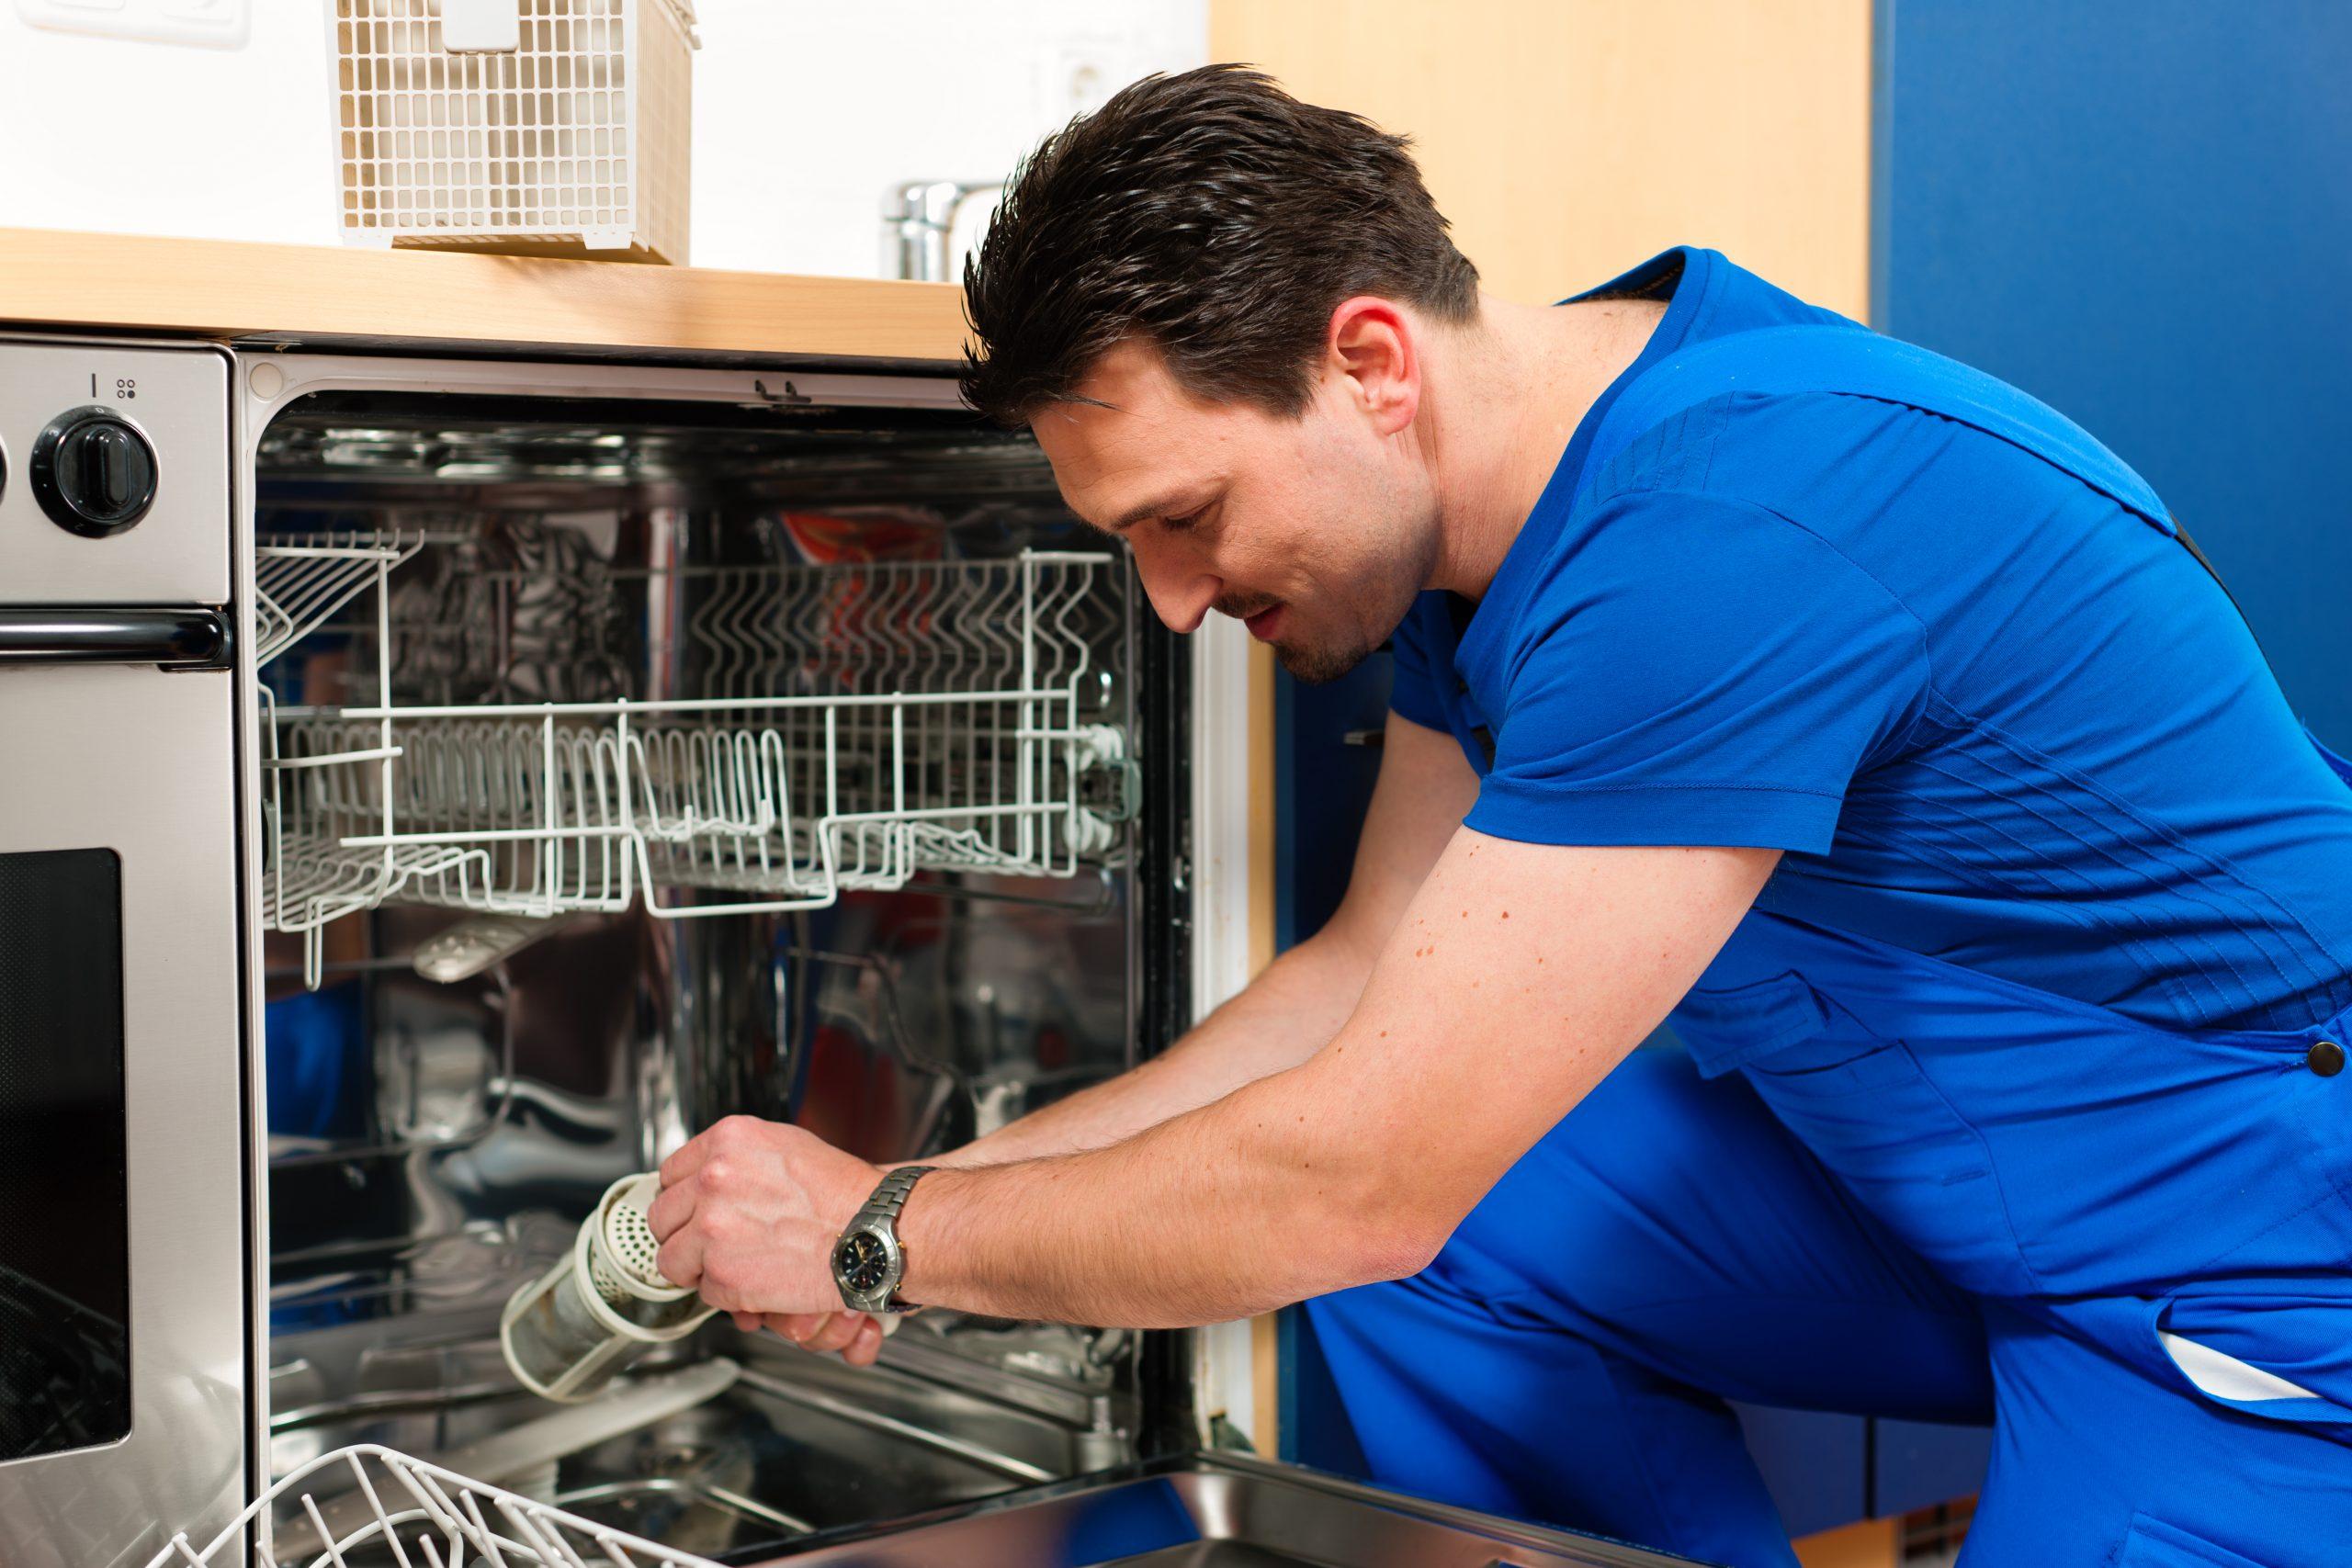 Dishwasher Repair Frisco | How to Repair Dishwasher